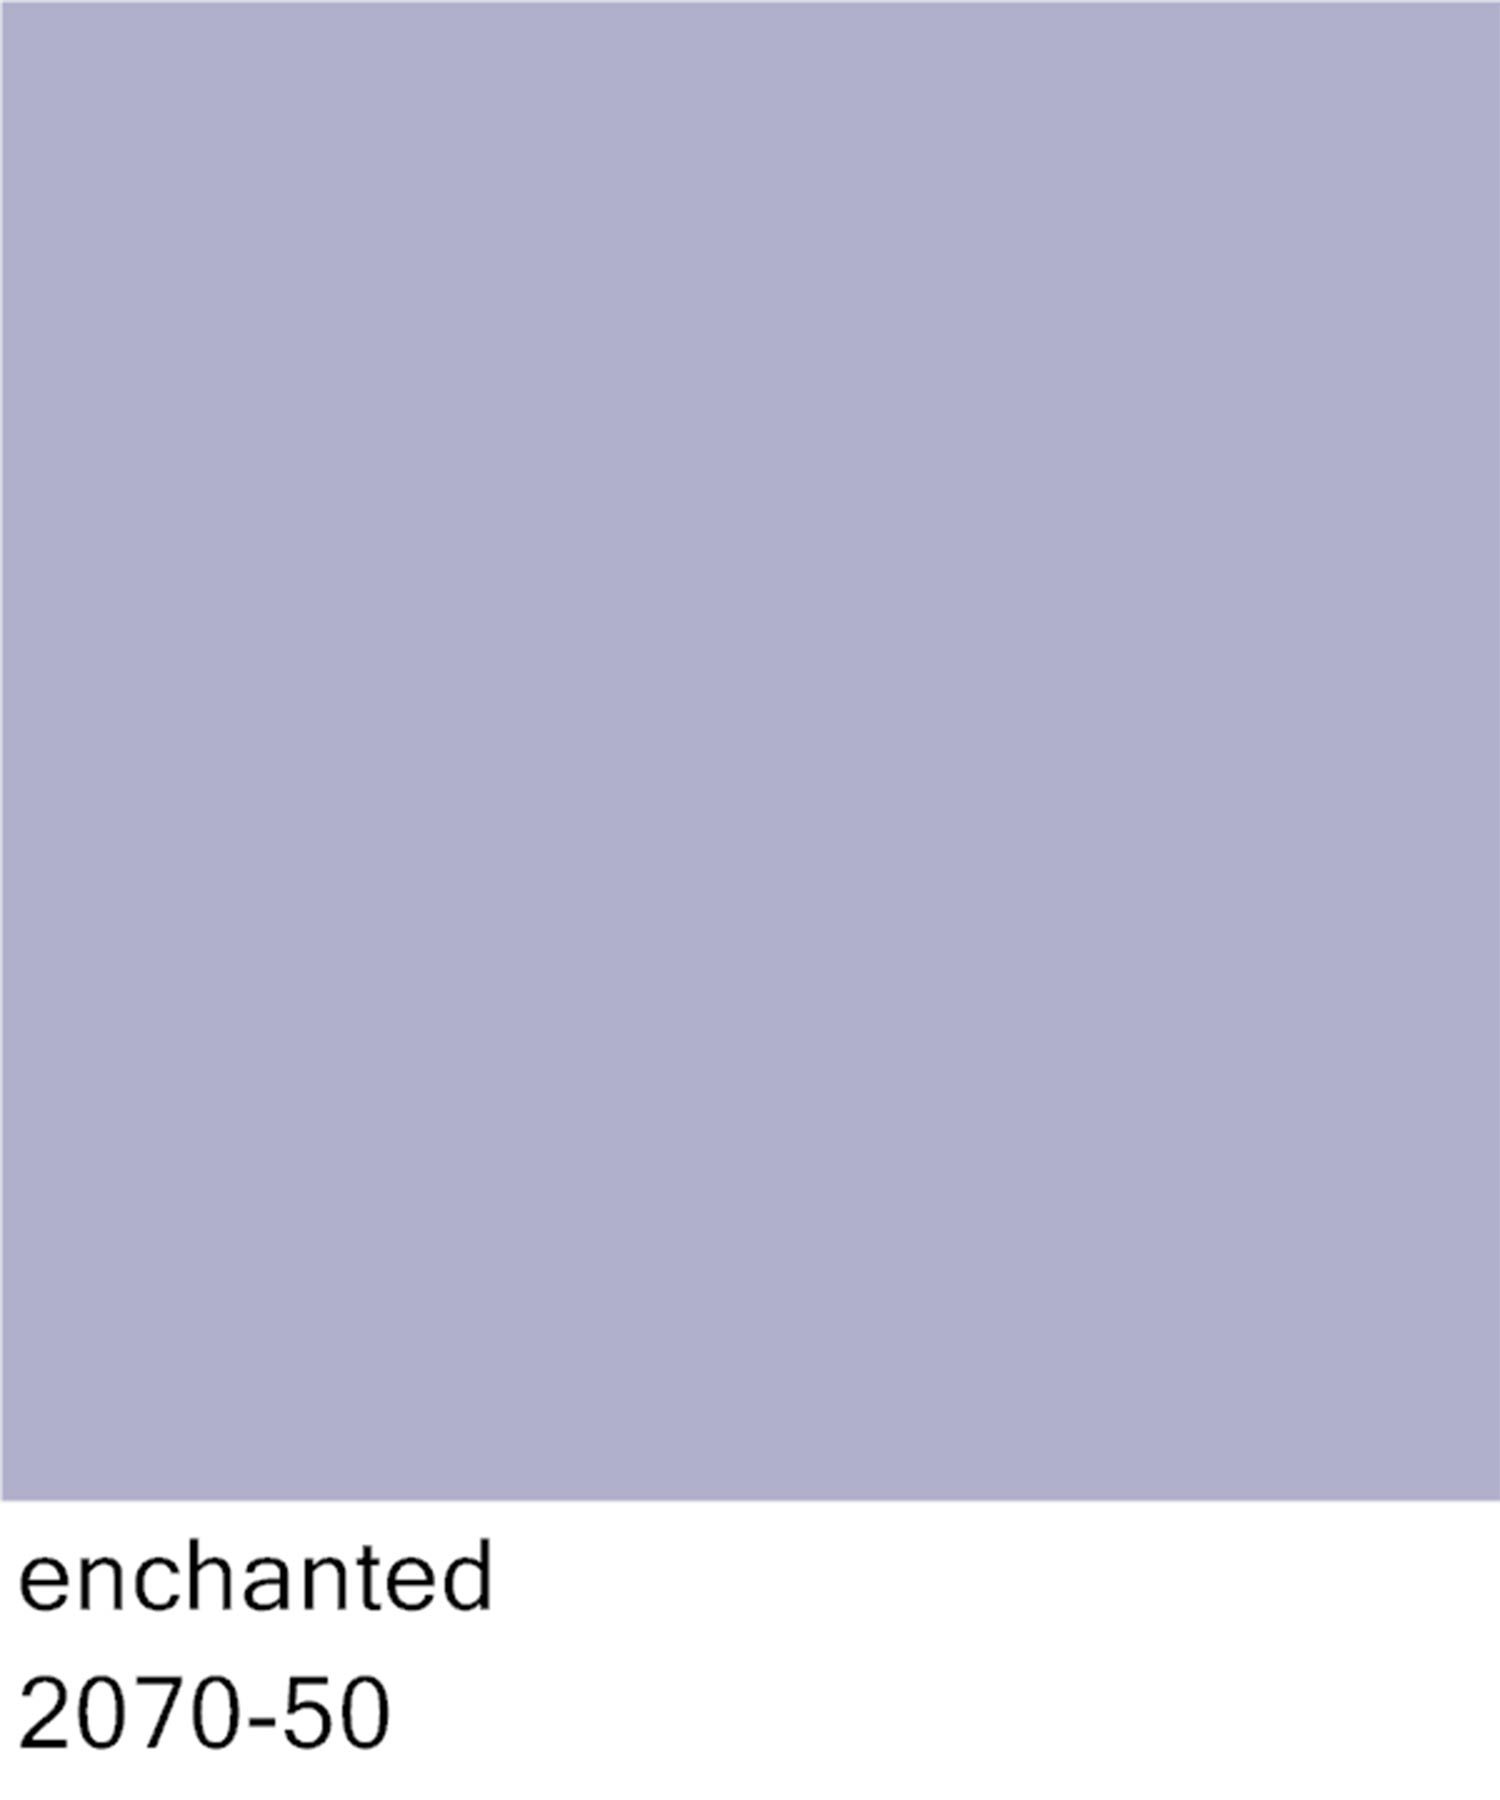 enchanted_2070-50-OPT.jpg